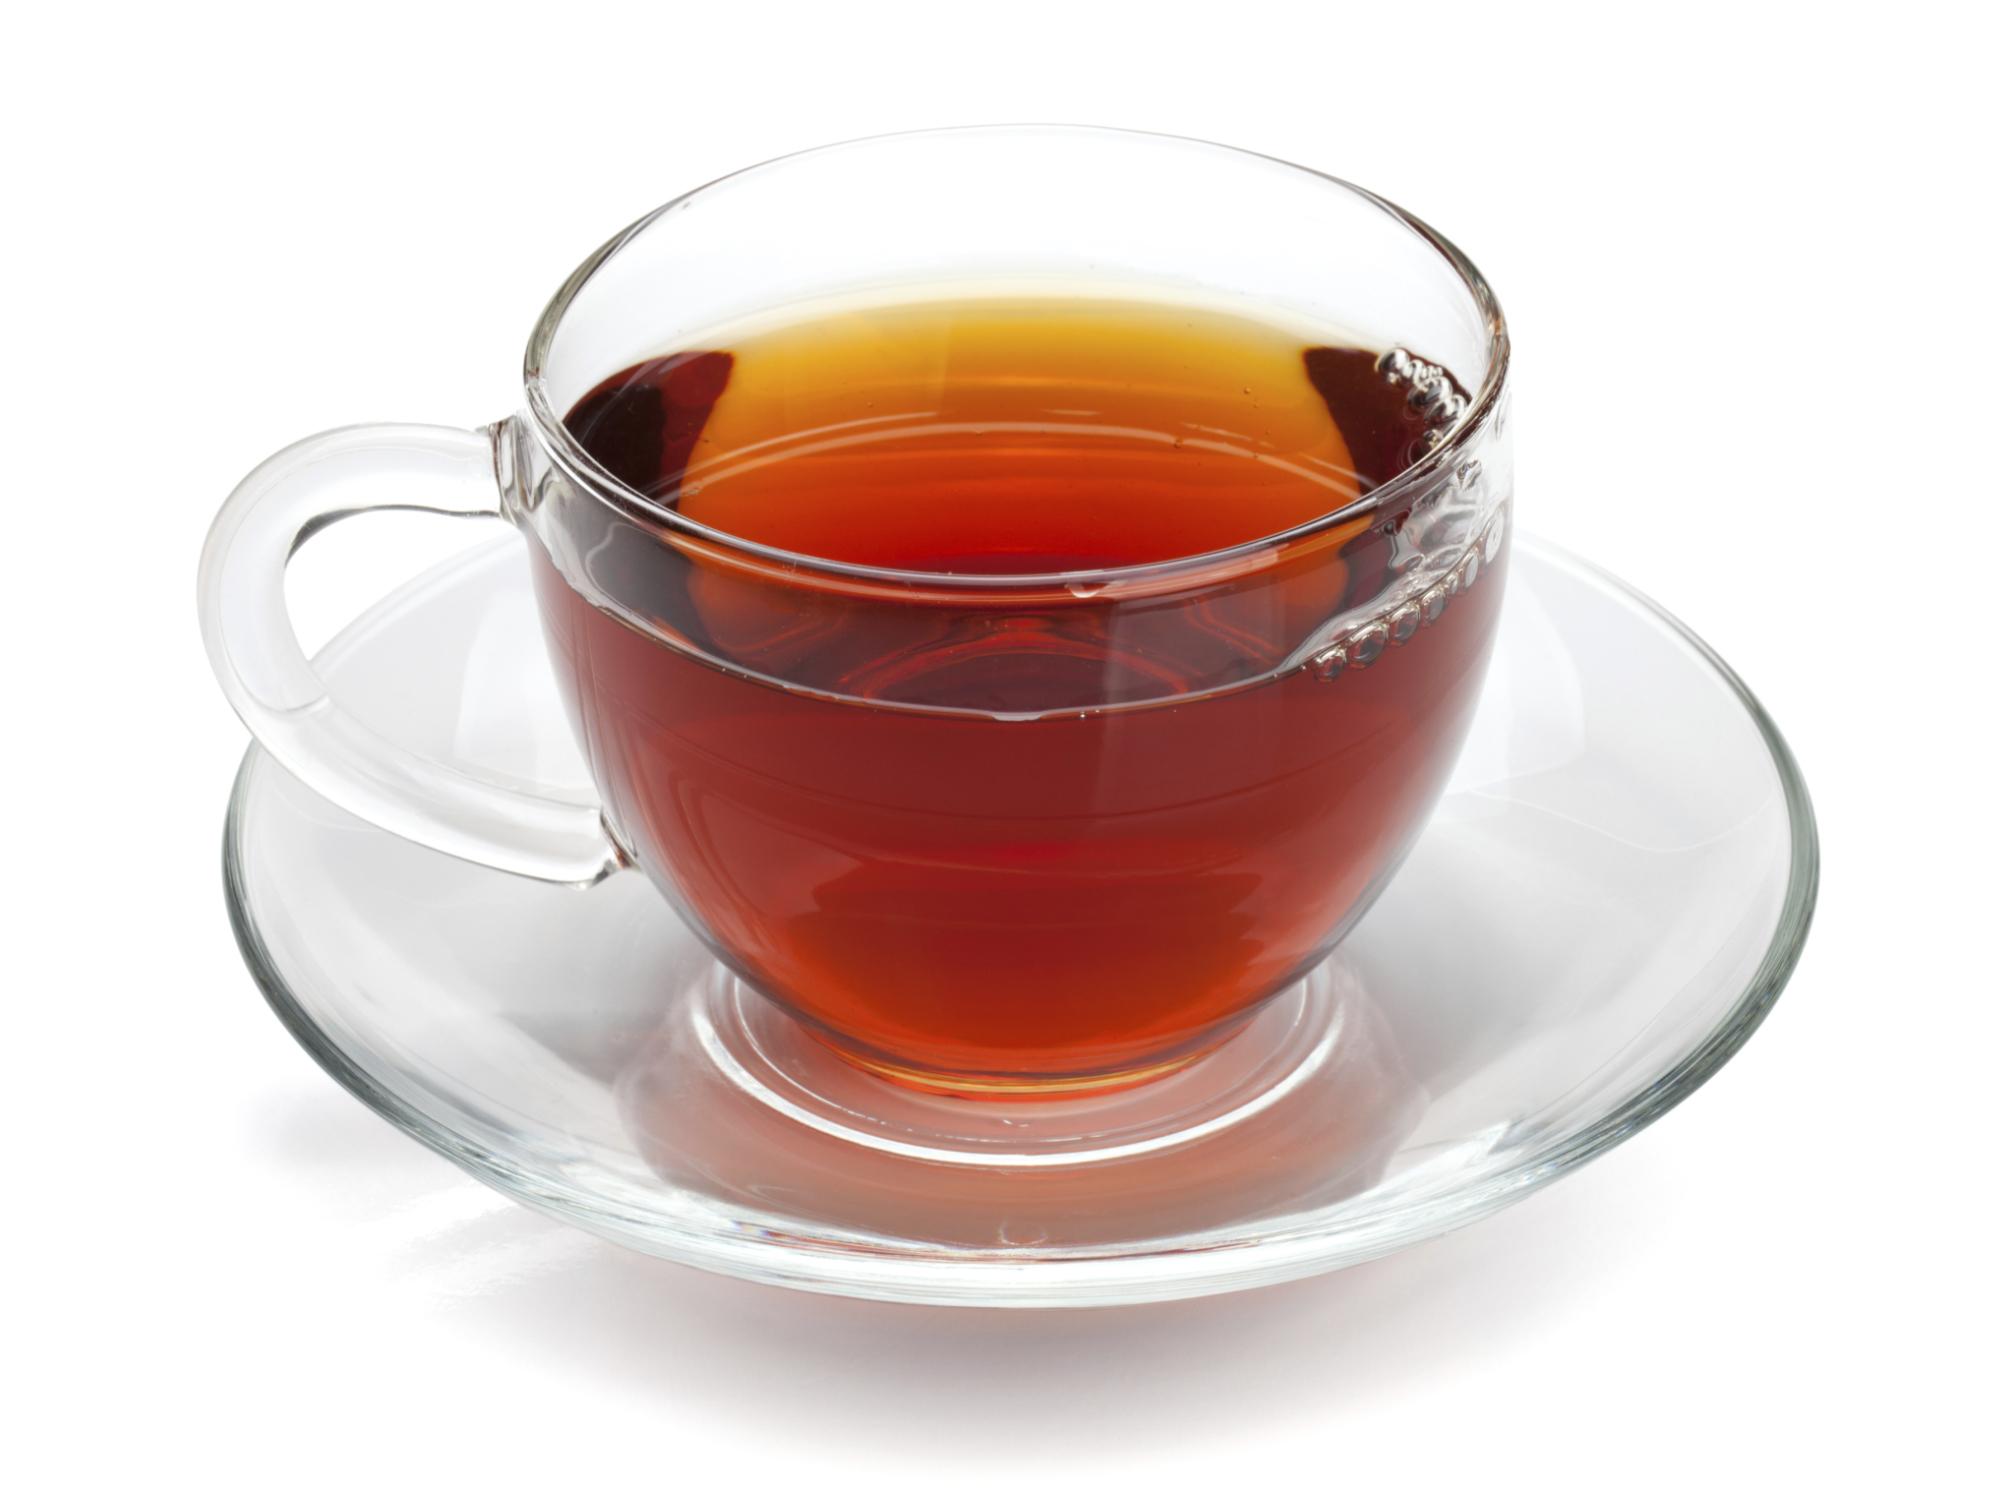 Cancer cure essiac herbal tea - Cancer Cure Essiac Herbal Tea 83